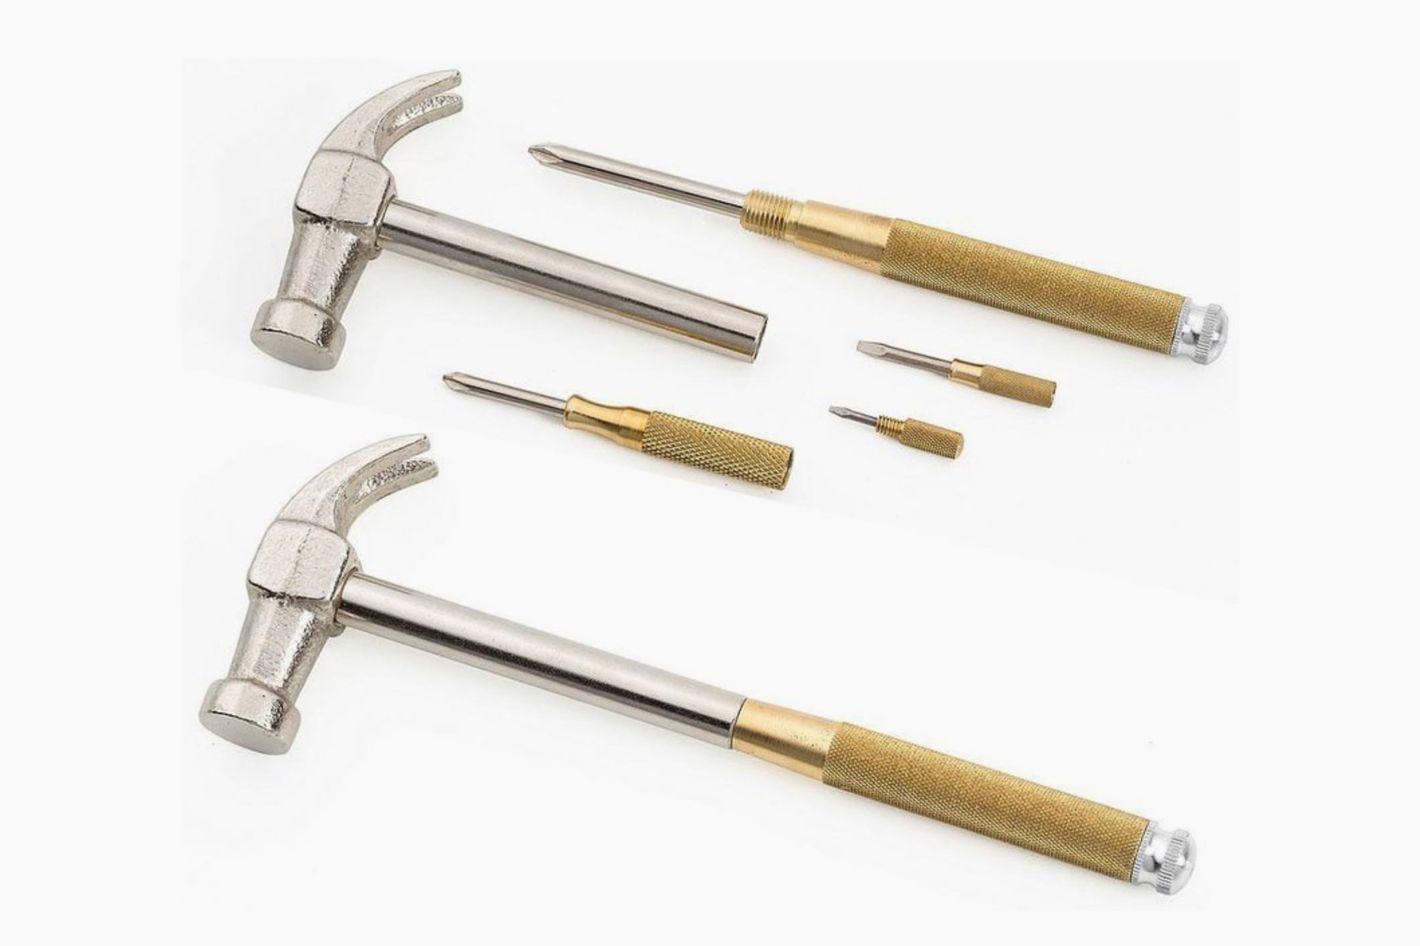 GAM 6-in-1 Hammer